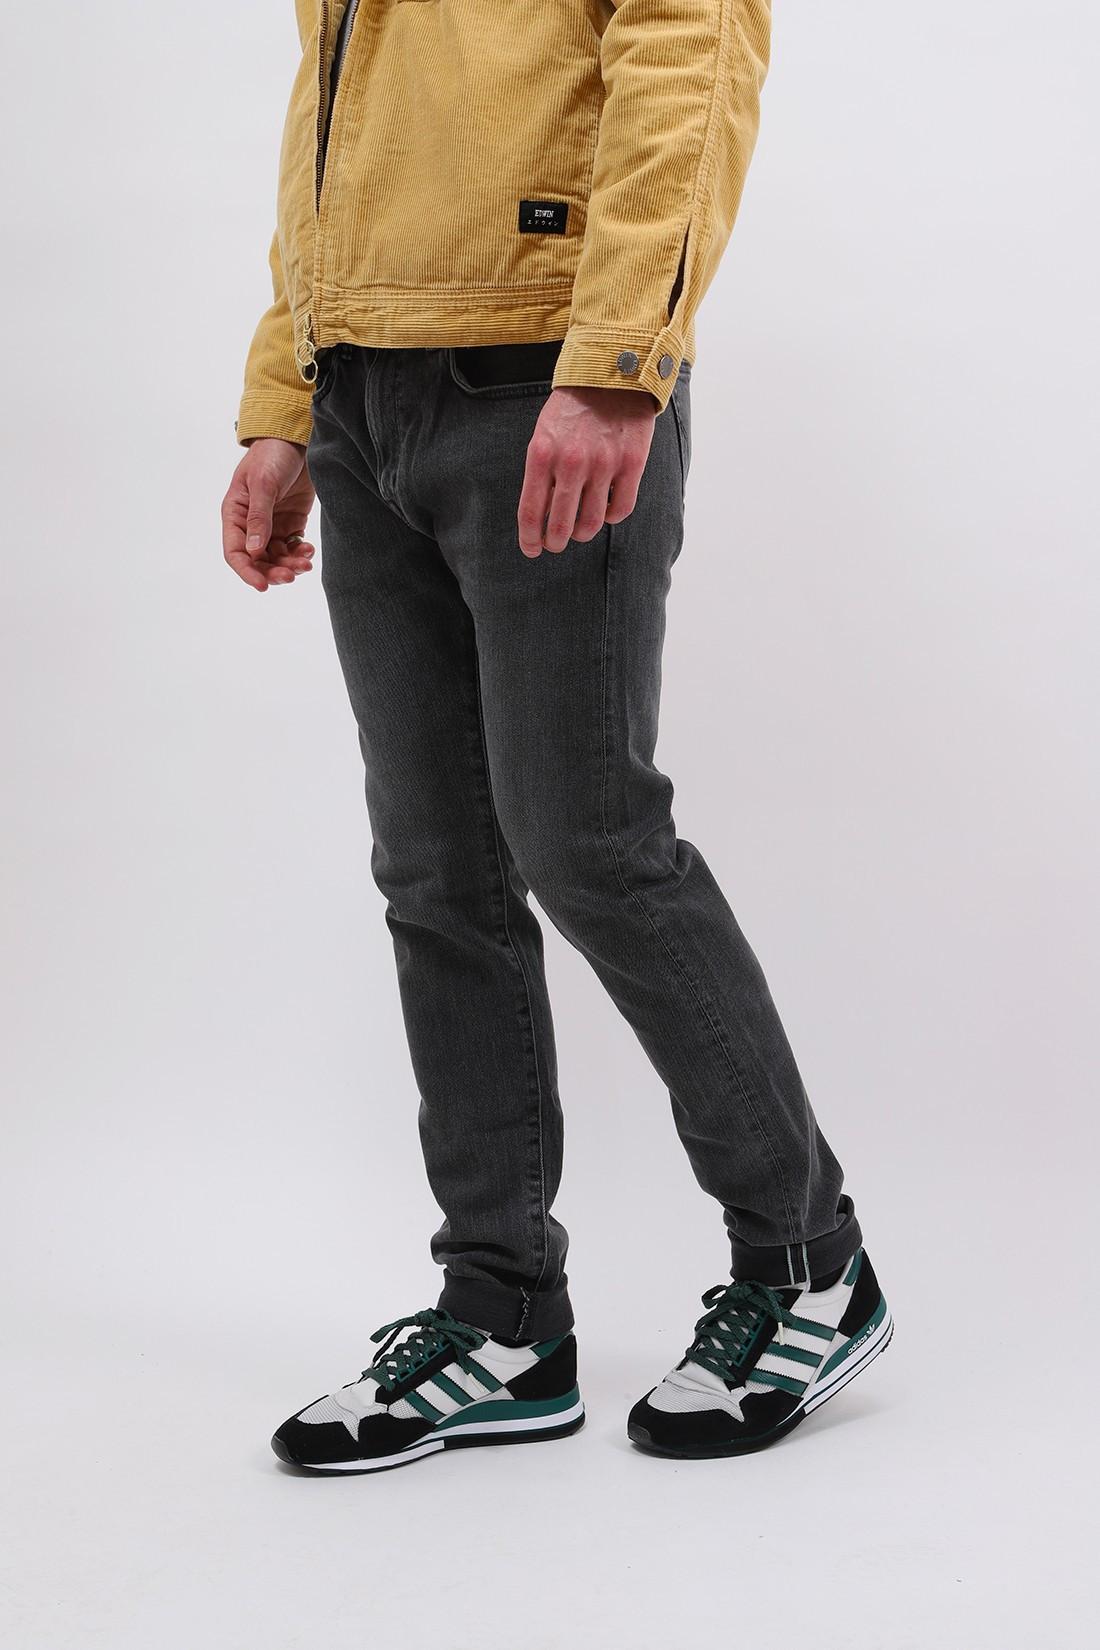 EDWIN / Slim tapered kaihara stretch Black gray used